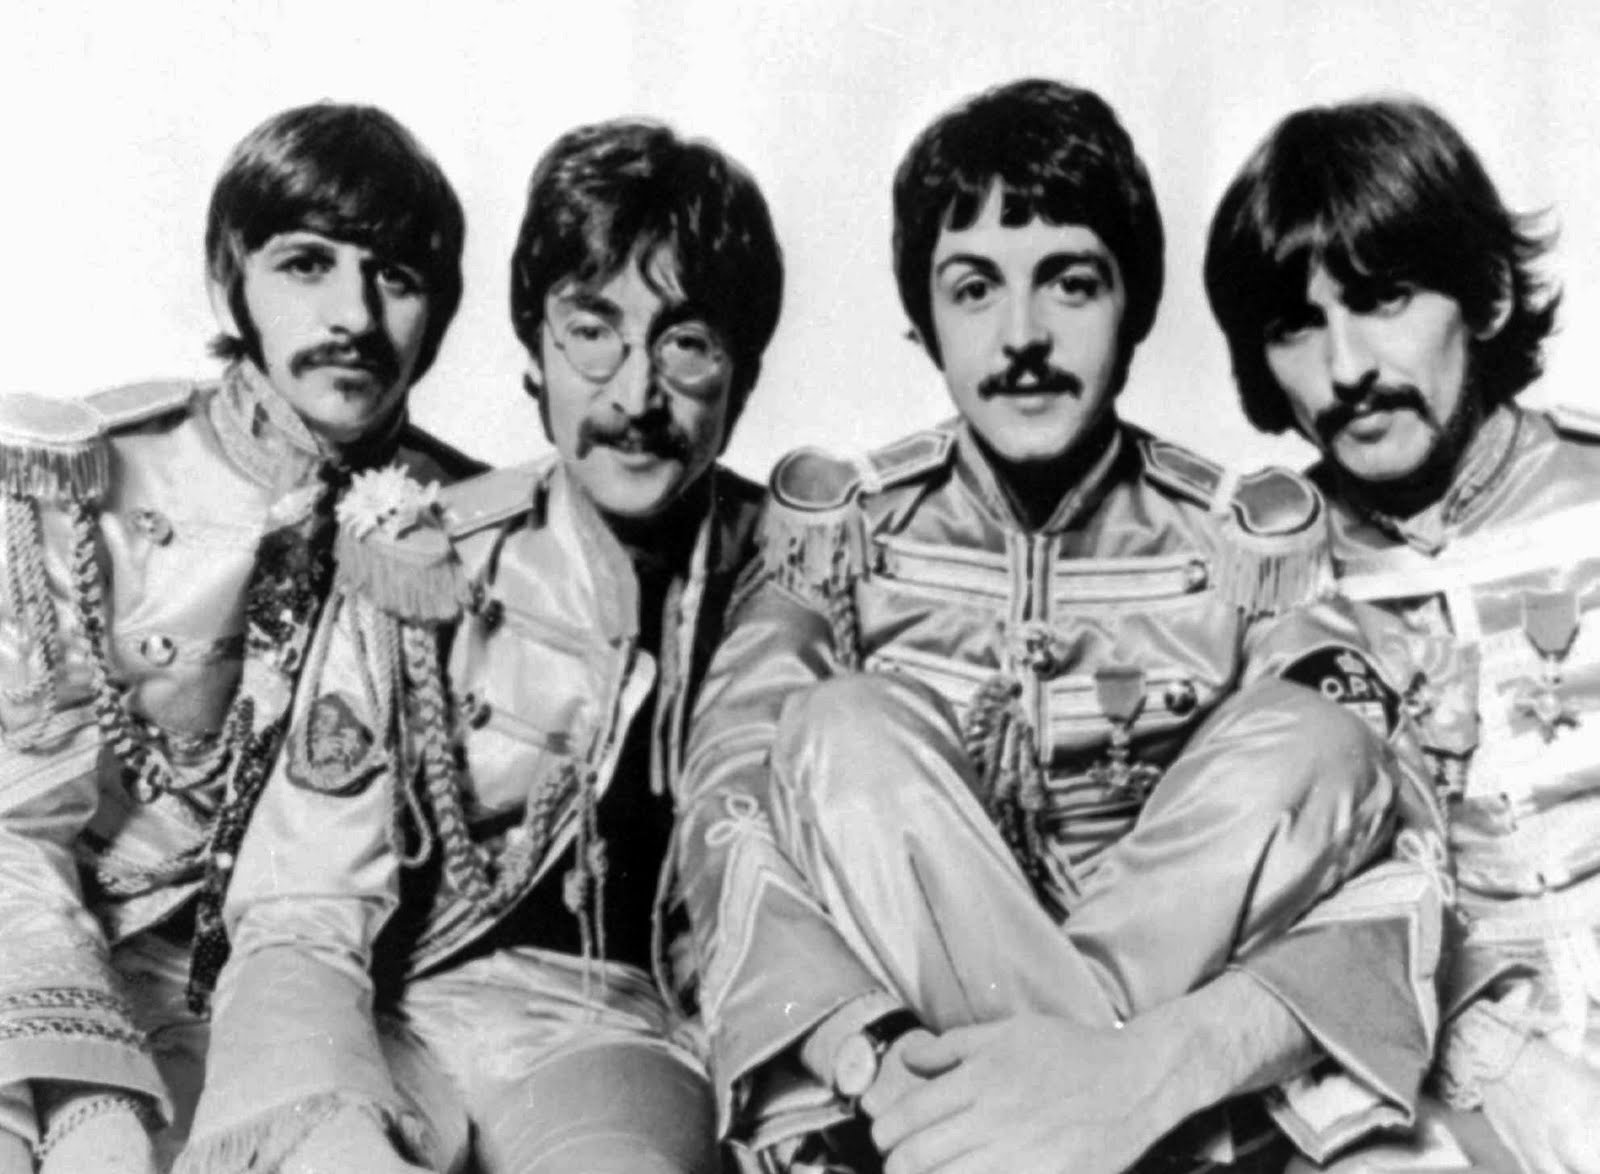 http://4.bp.blogspot.com/-nFXFqiq9LN0/Tq_rwUplyII/AAAAAAAAAp8/x4uzJlhN5QE/s1600/7+The+Beatles.jpg